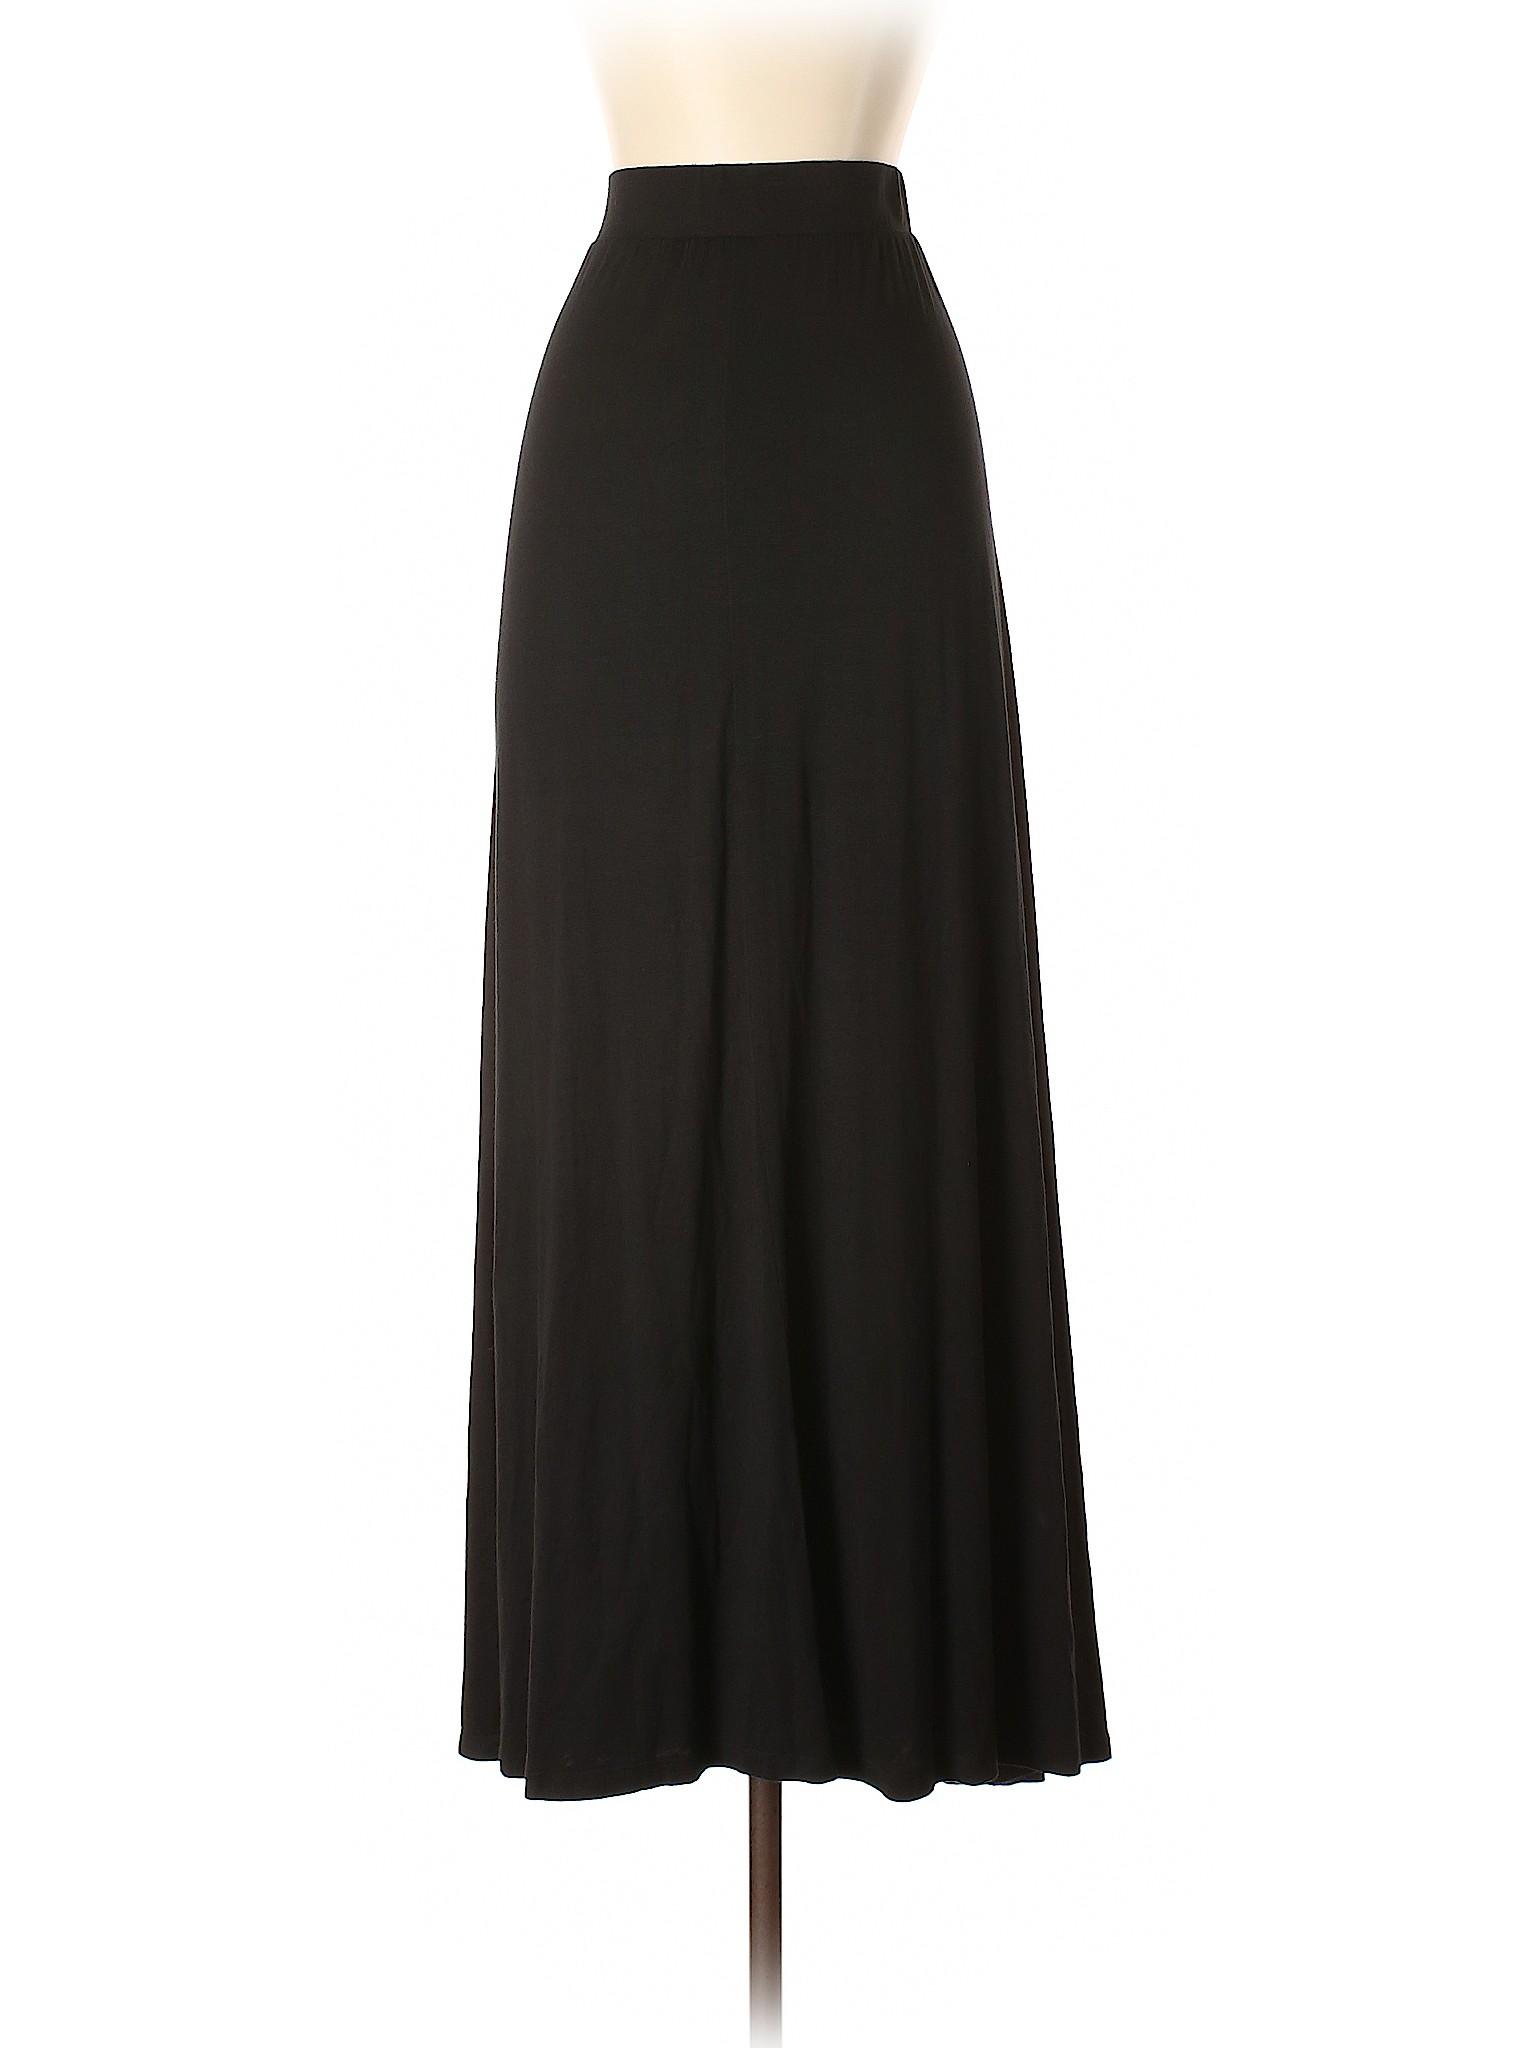 Skirt Skirt amp;co amp;co Boutique Boutique amp;co Style Boutique Style Style Casual Skirt Style Casual amp;co Boutique Casual WaqzIwxSz